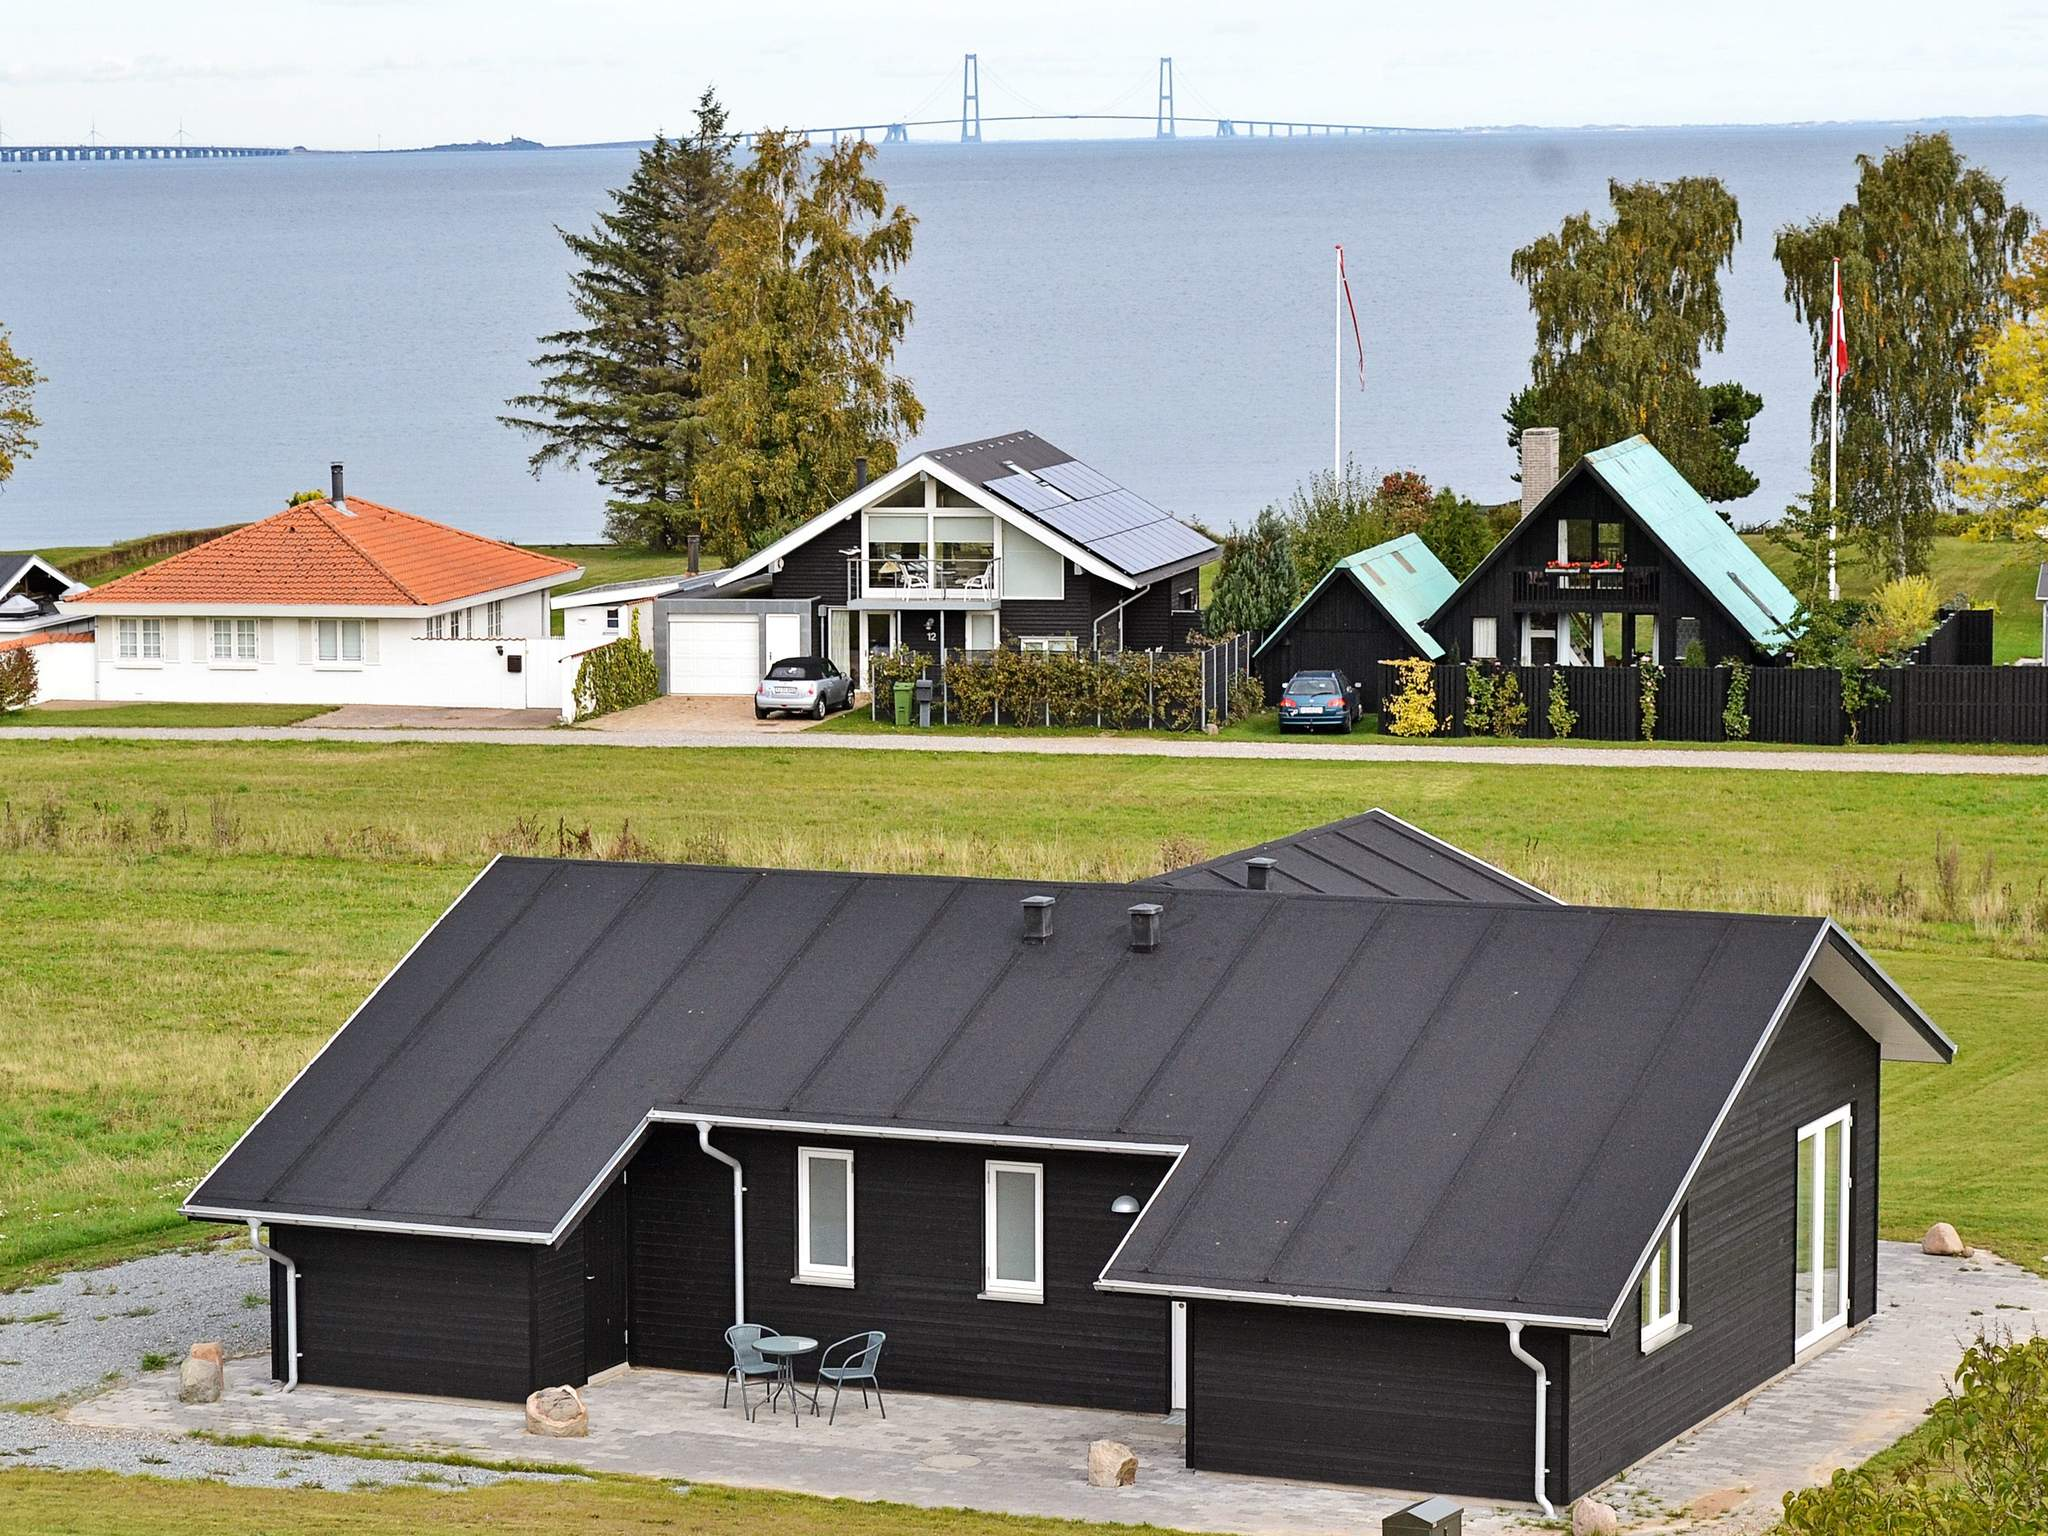 Ferienhaus Tårup Strand (850954), Tårup, , Fünen, Dänemark, Bild 14